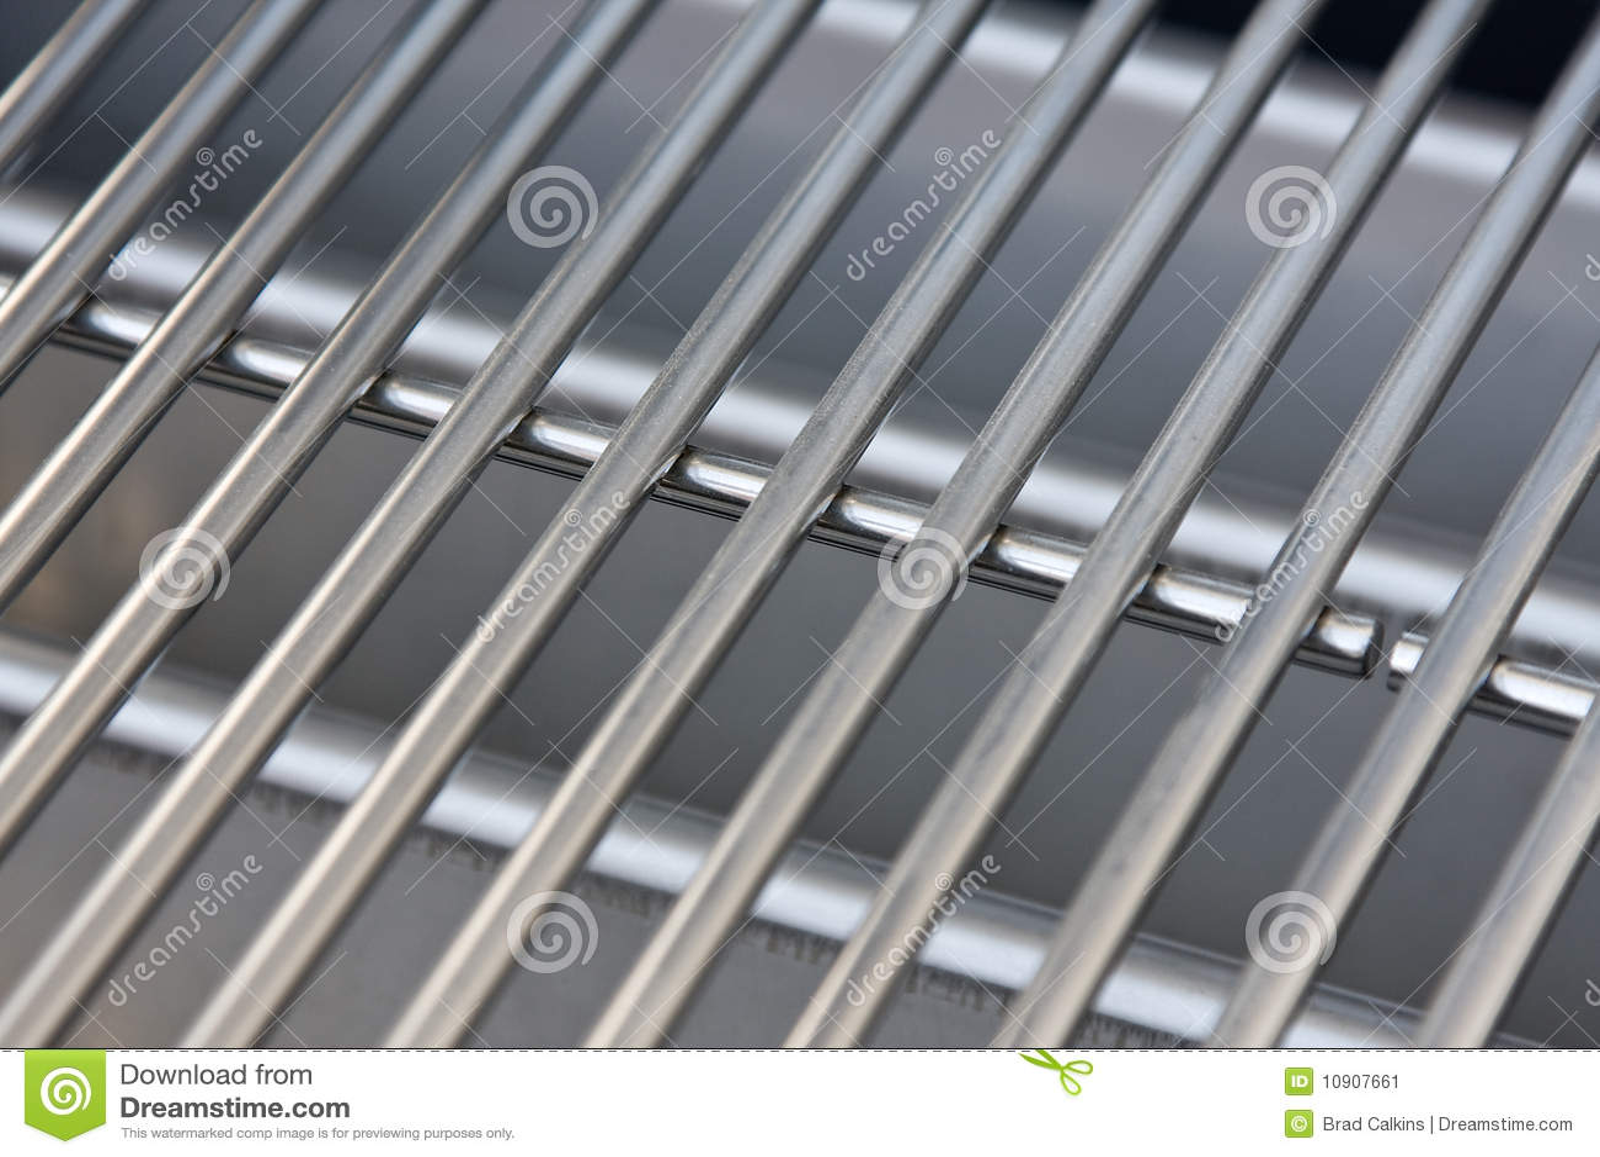 Parrilla del acero inoxidable imagen de archivo imagen - Barbacoas acero inoxidable ...